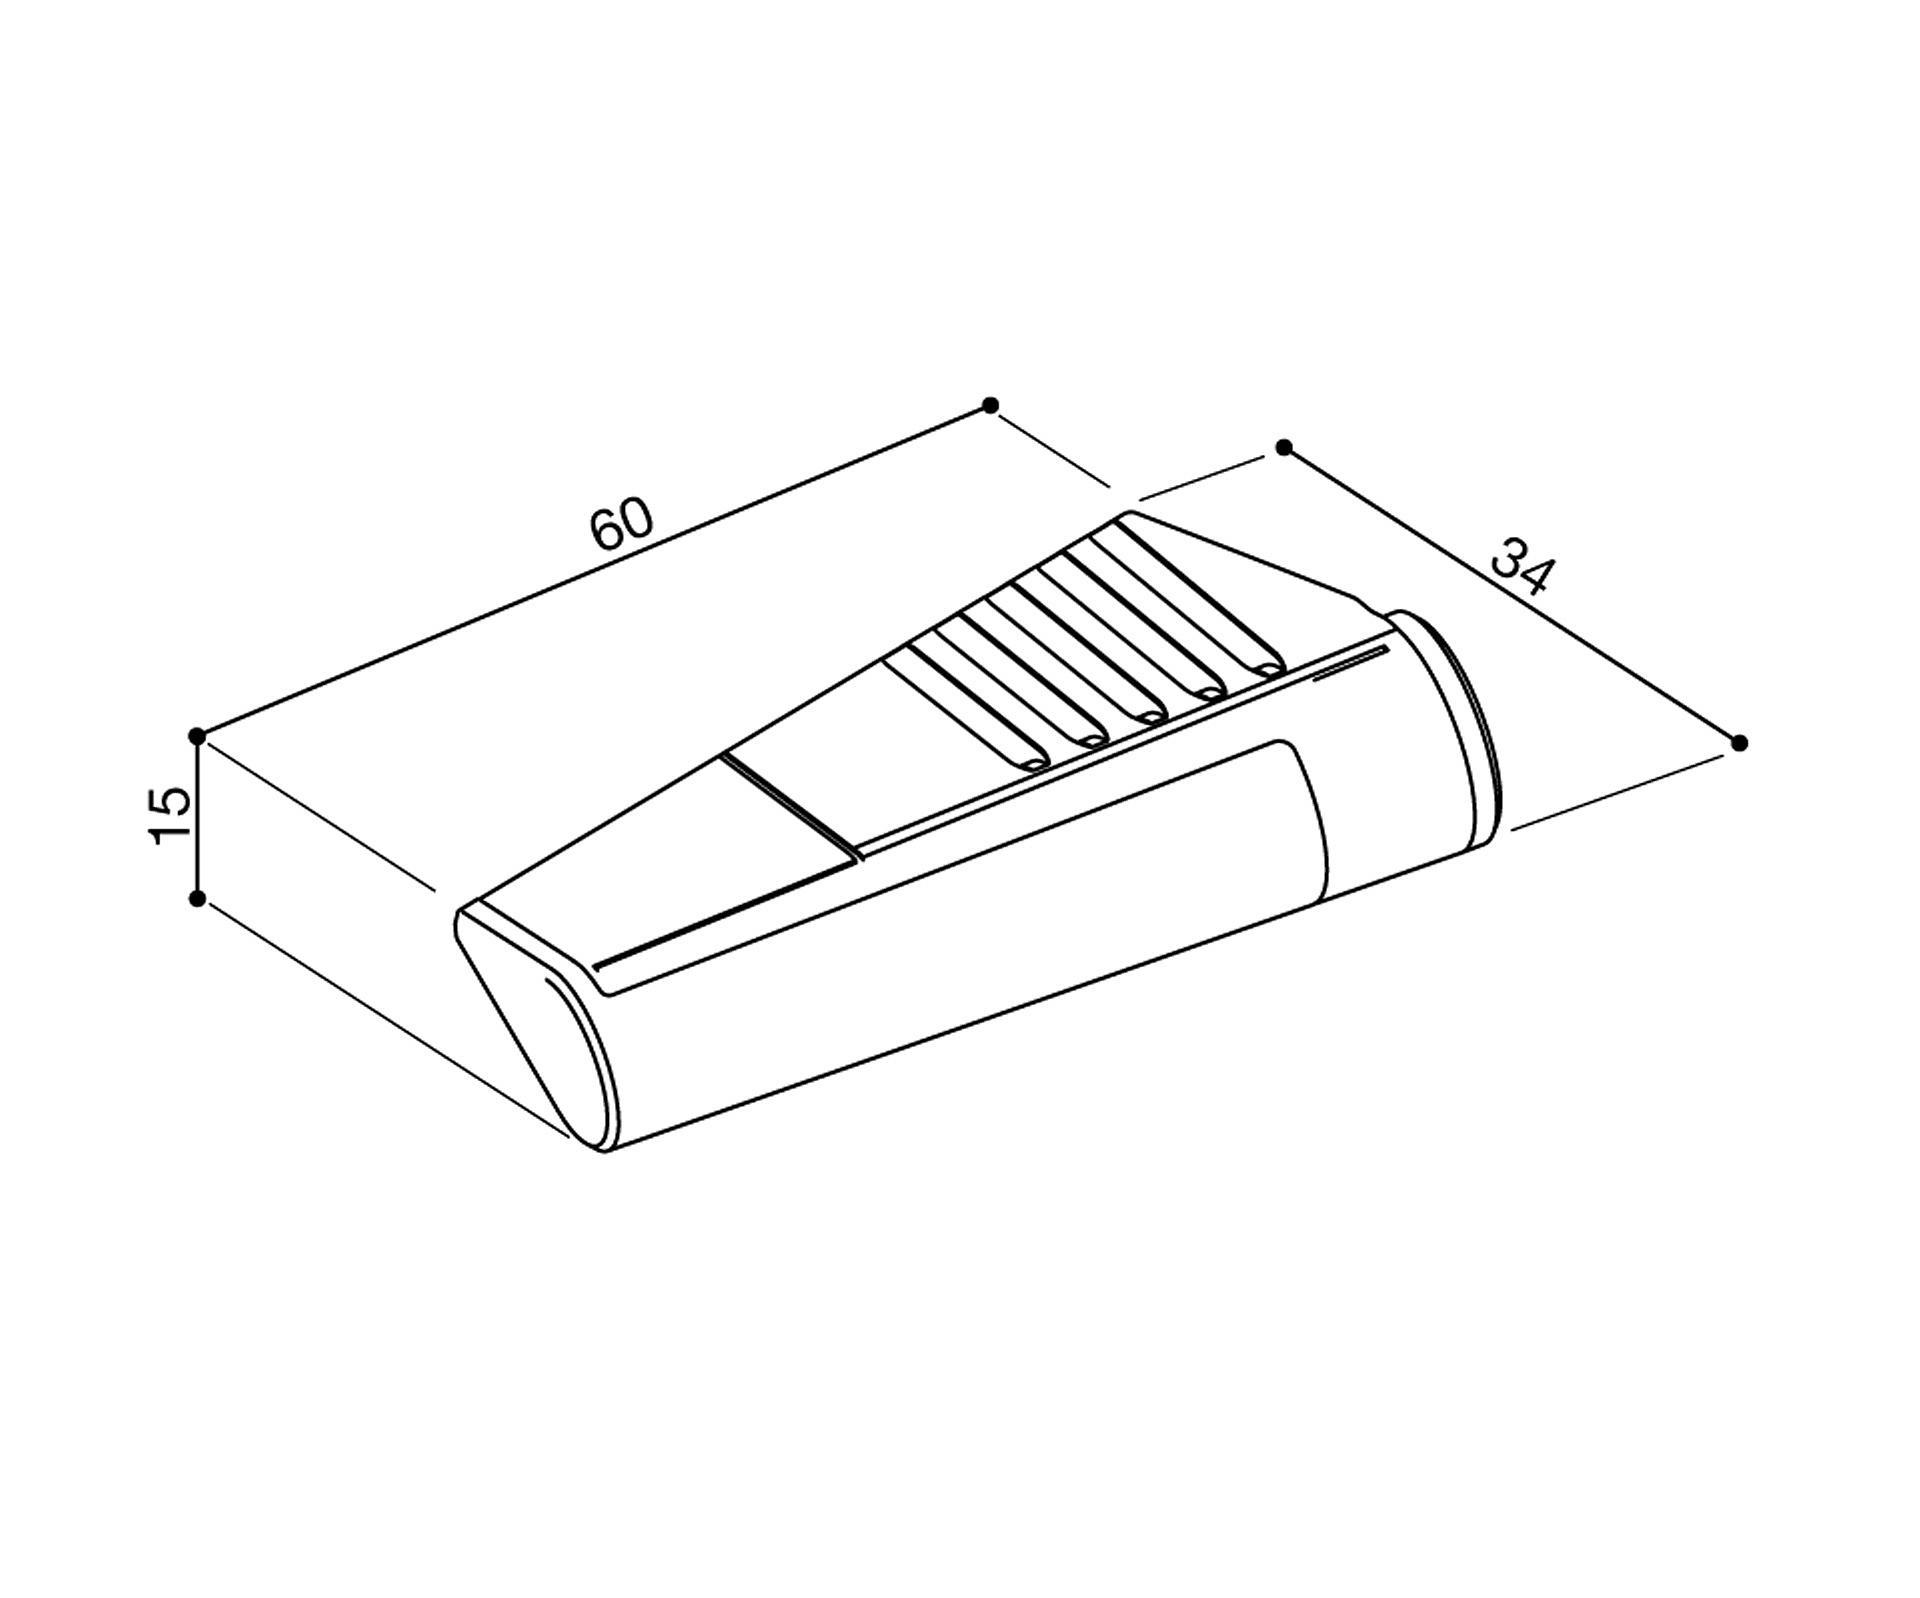 Sl350 Wiring Diagram Trusted Schematics Honda Ca95 Snap Harness Automotive Diagrams